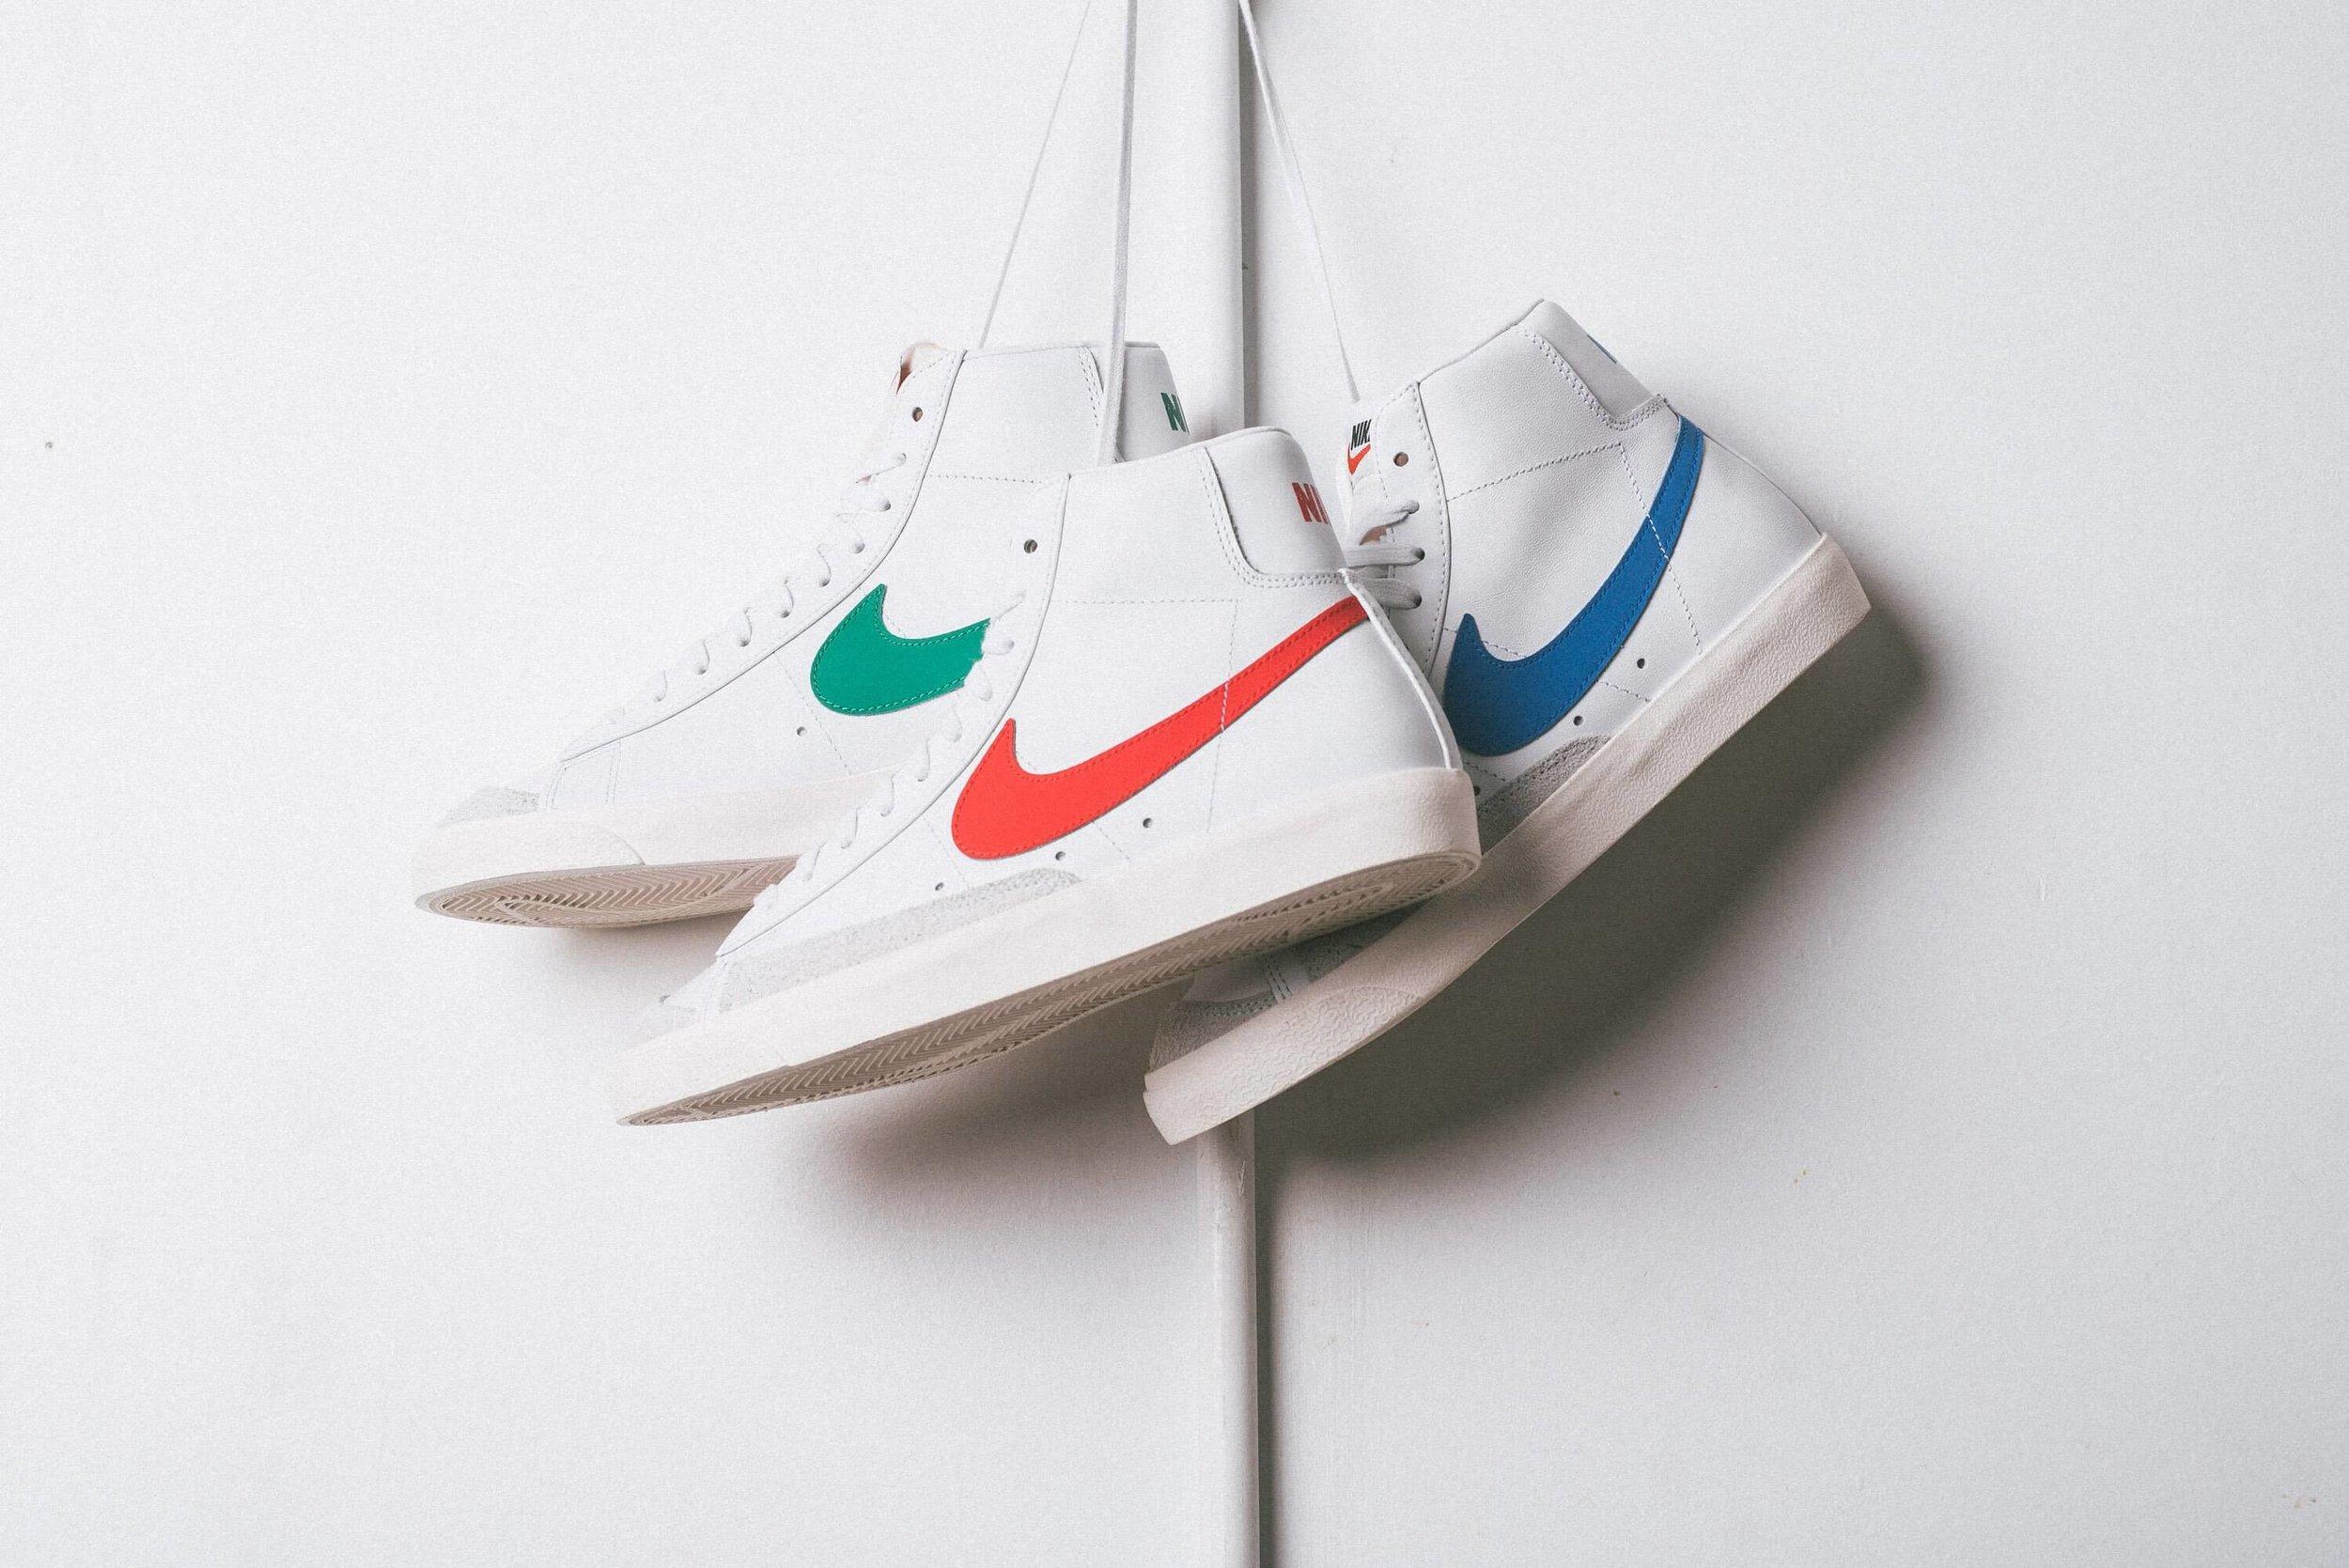 Nike_Blazer_mid_77_Vintage_Pacific_Blue_White_Sail_BQ6806-400_Sneaker_Politics_Group_1.jpg